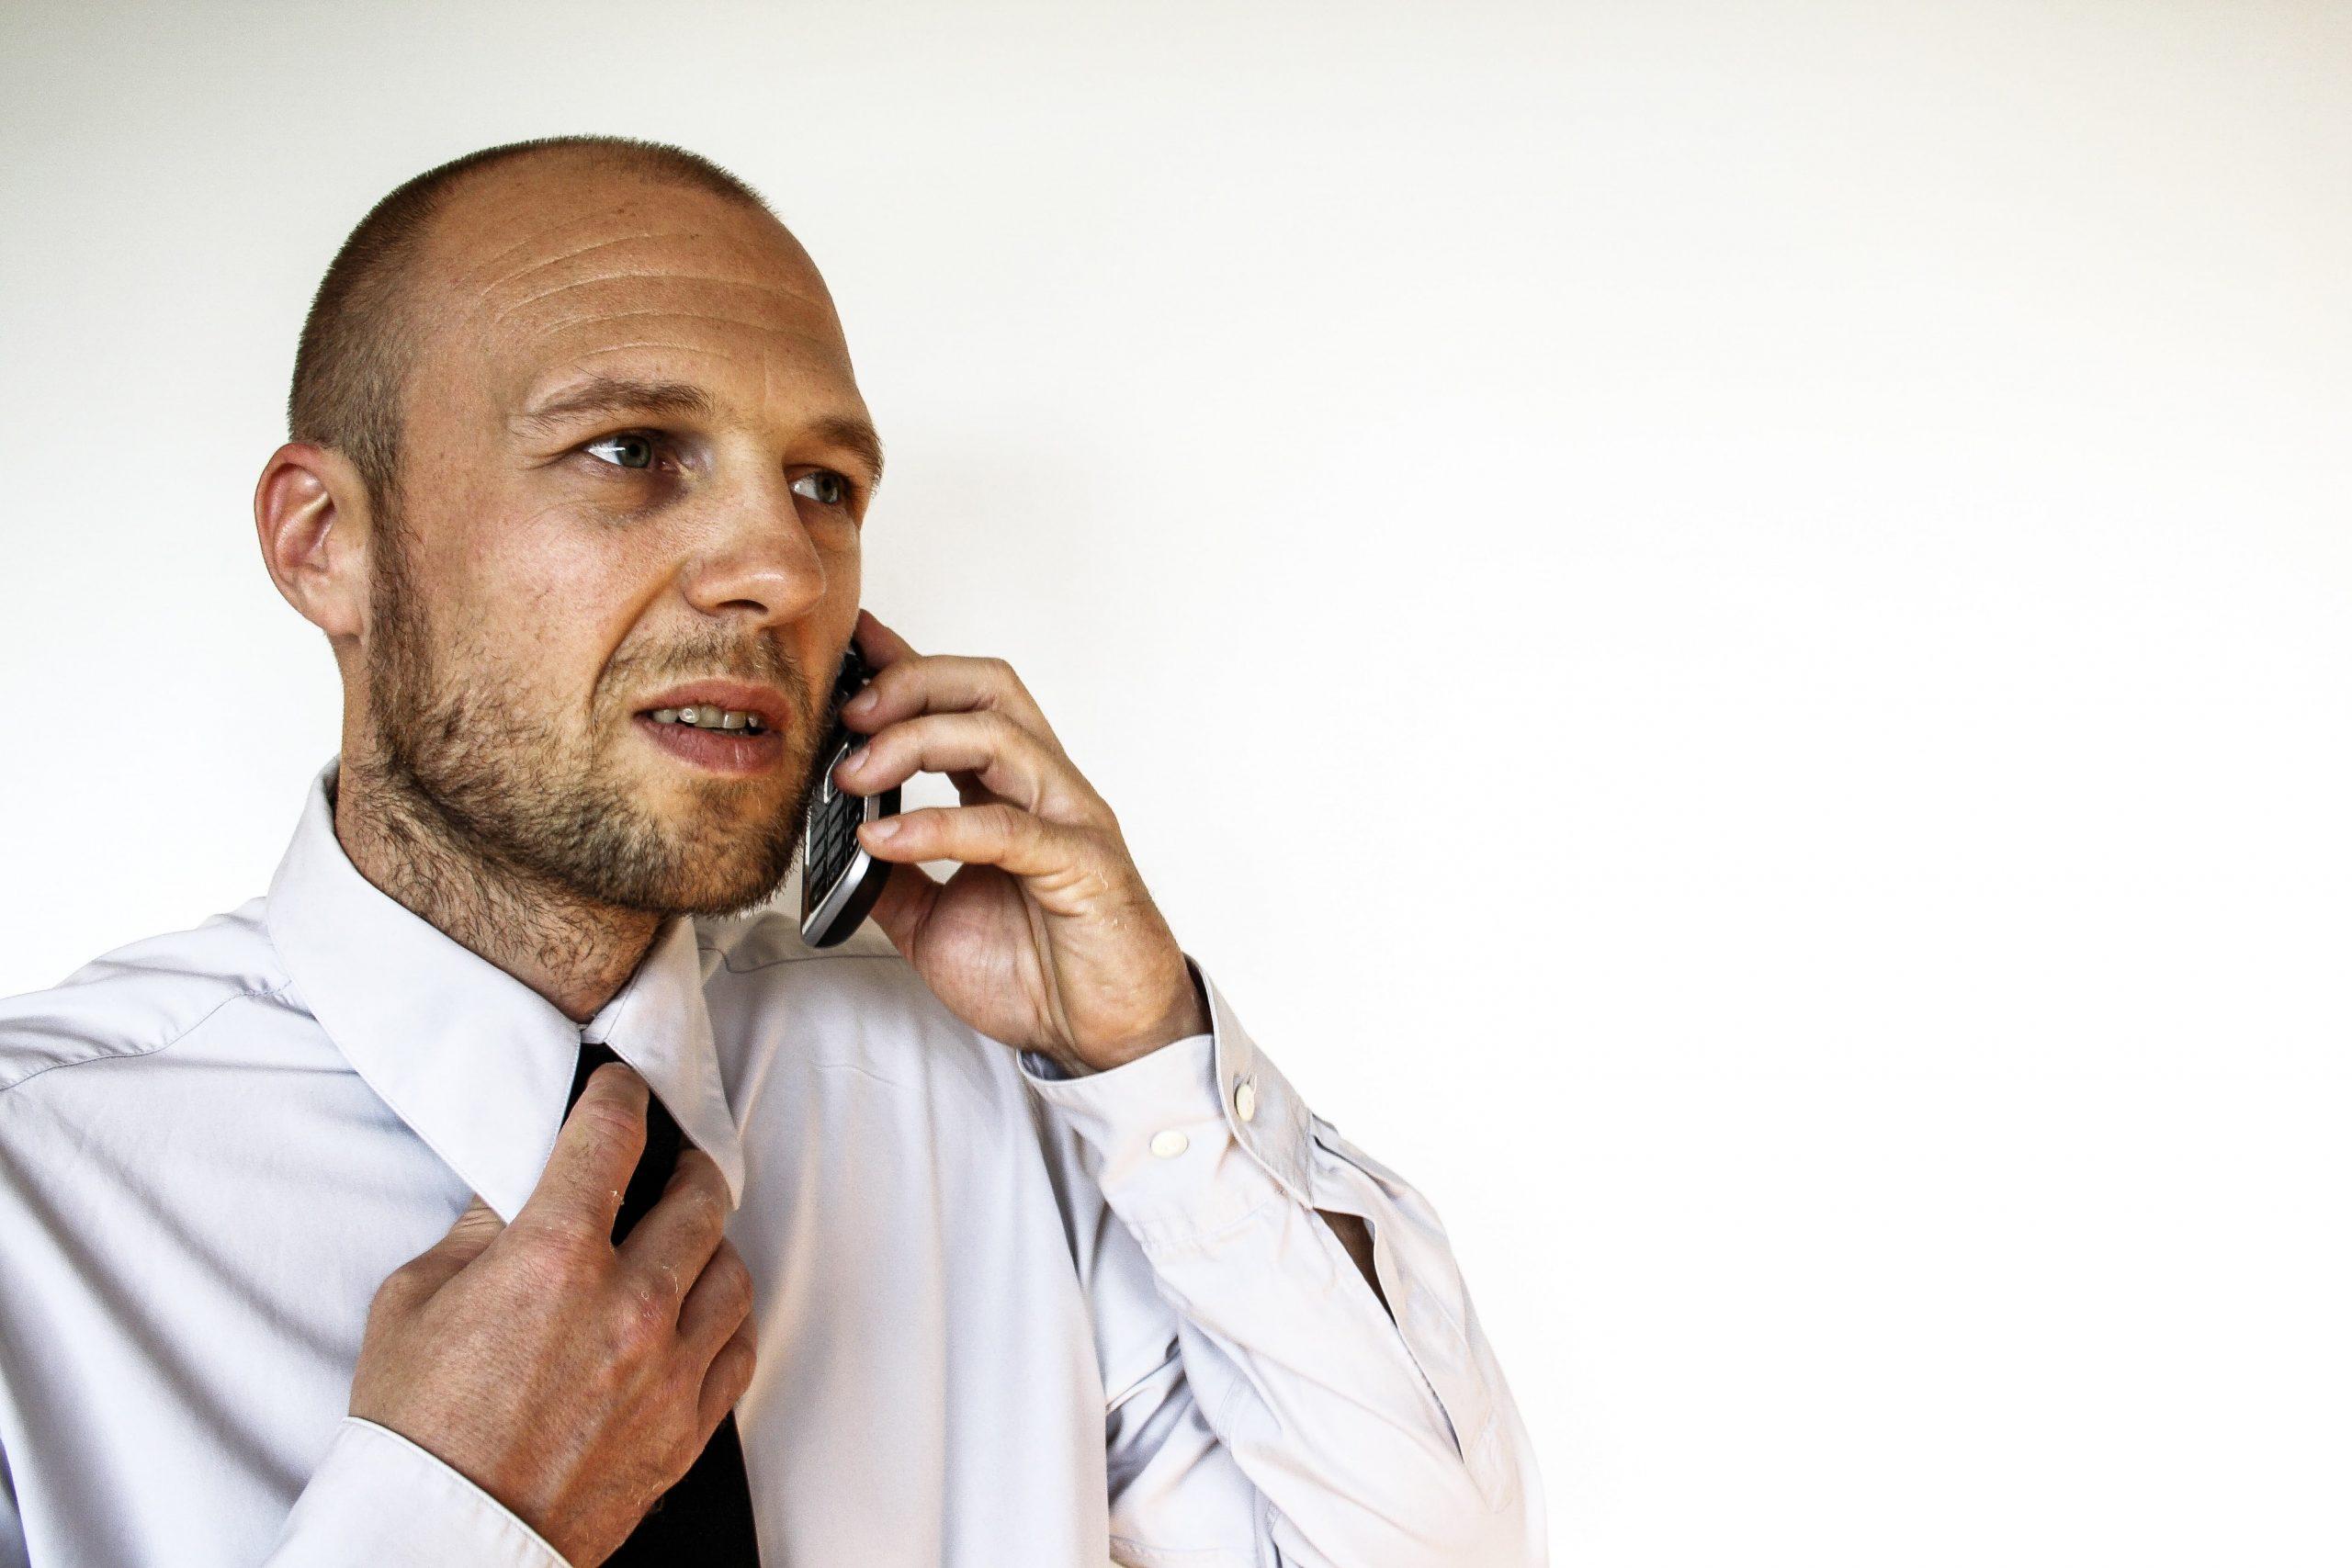 Businessman phone call talking about cultural recruitment videos.